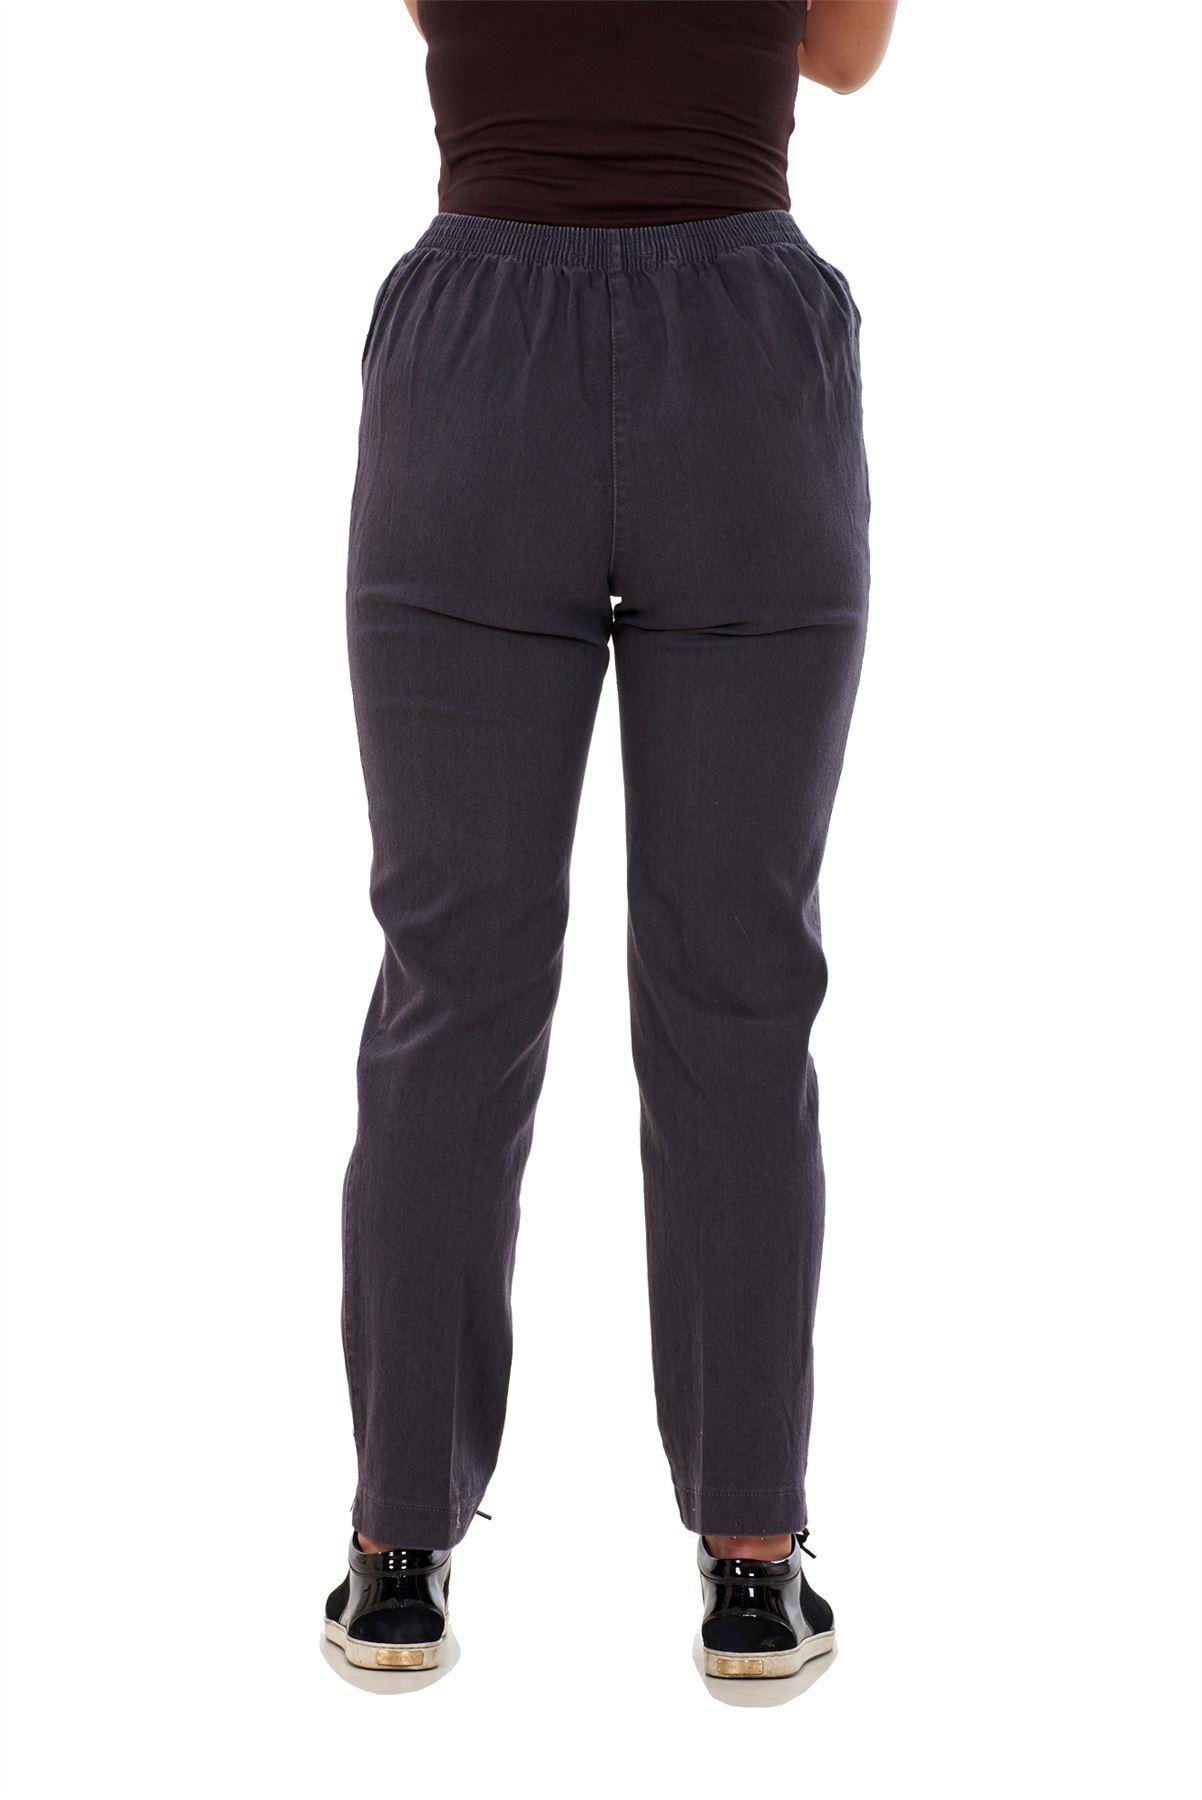 Ladies-Women-Trousers-Rayon-Cotton-Pockets-Elasticated-Stretch-Black-pants-8-24 thumbnail 9